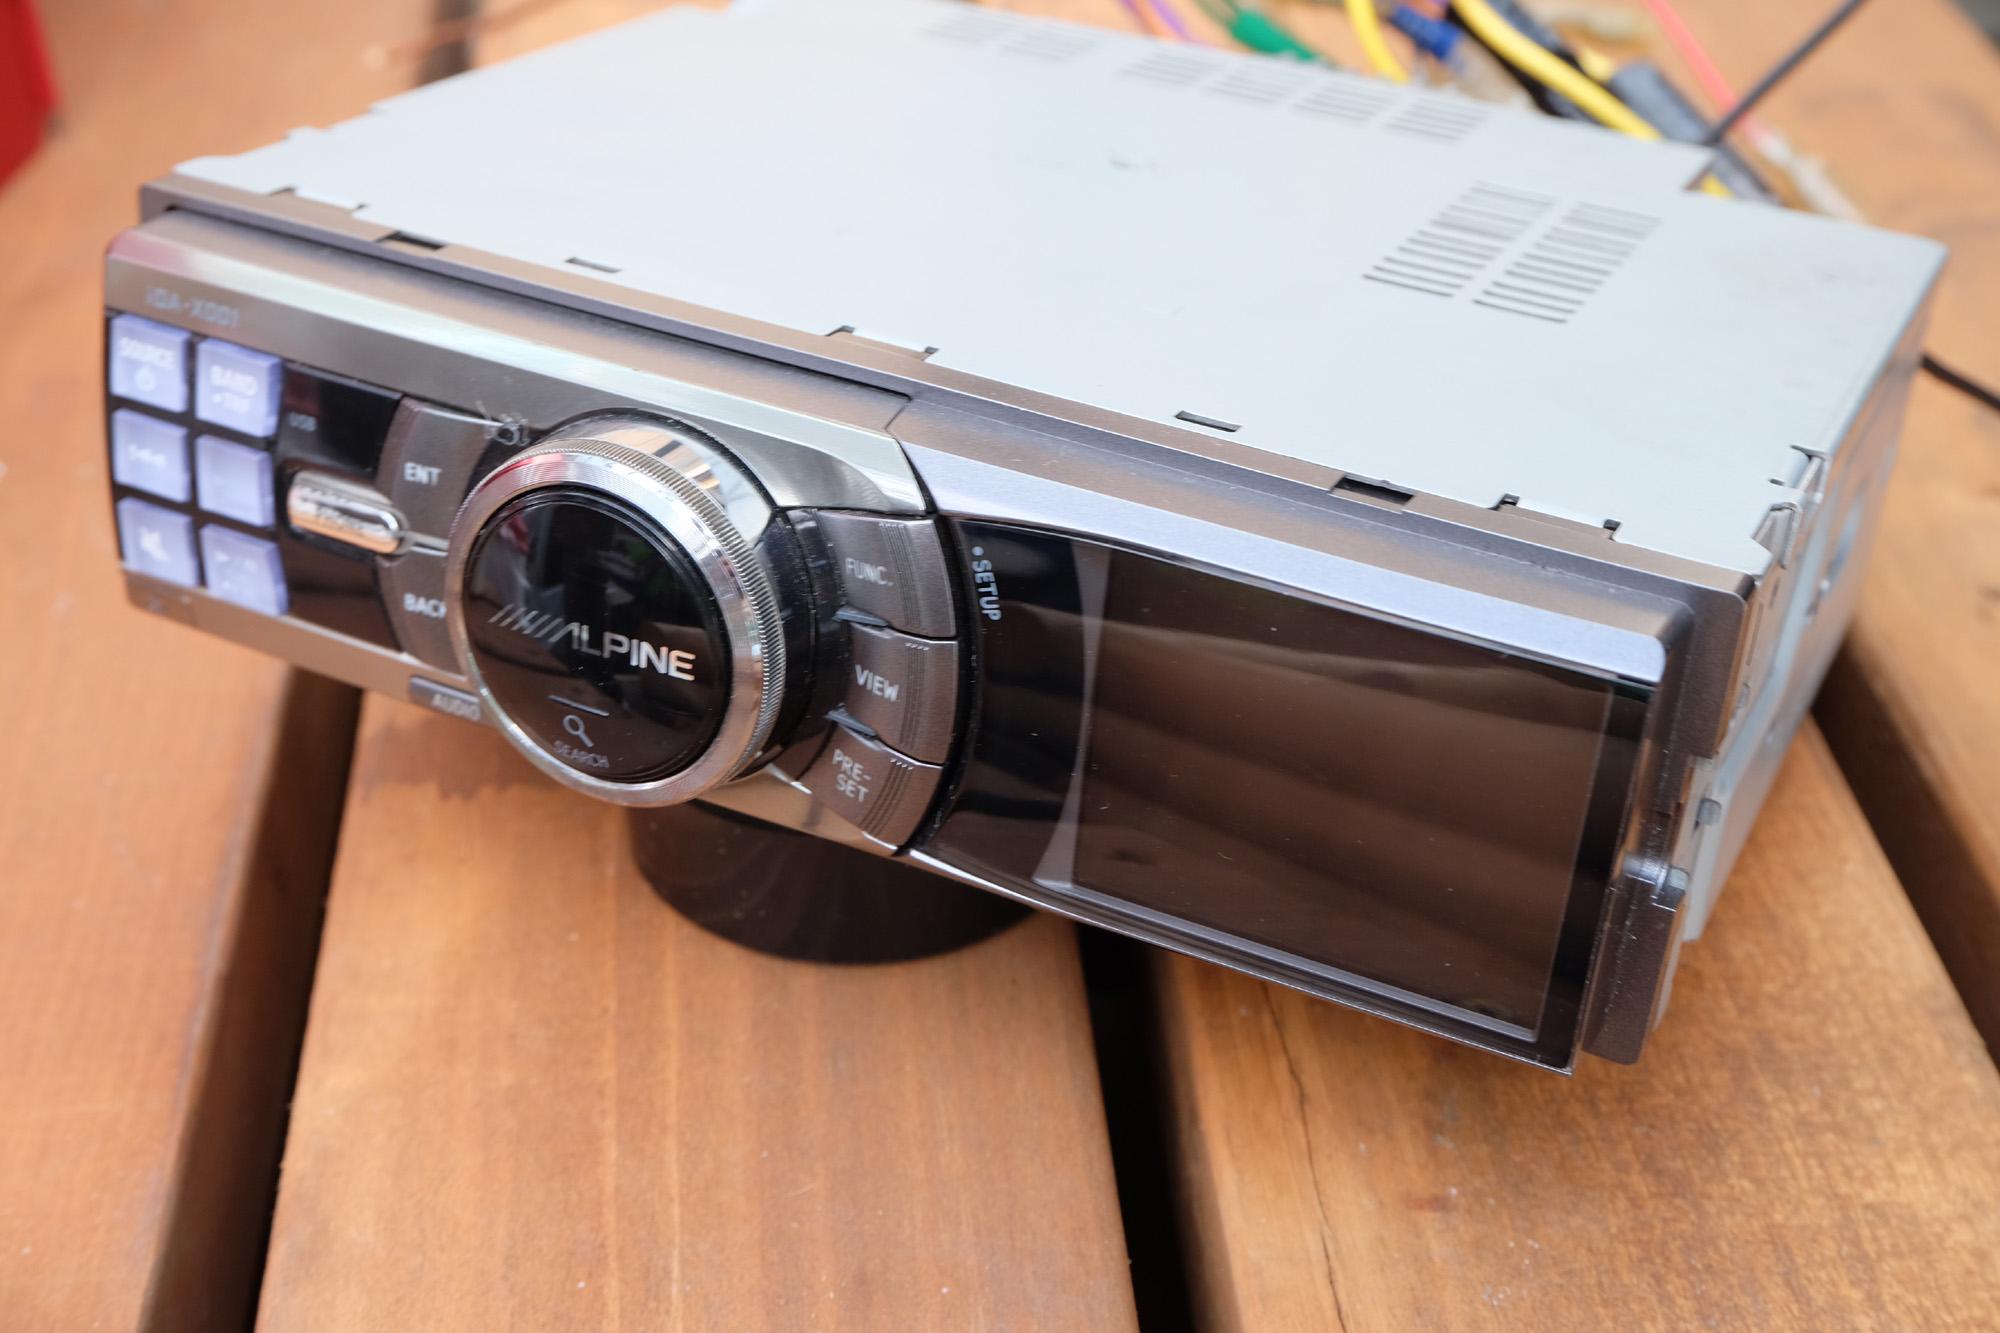 ALPIN iDA-X001 中古購入! iPodが使える~!(^o^) ビッグホーン USB26GW